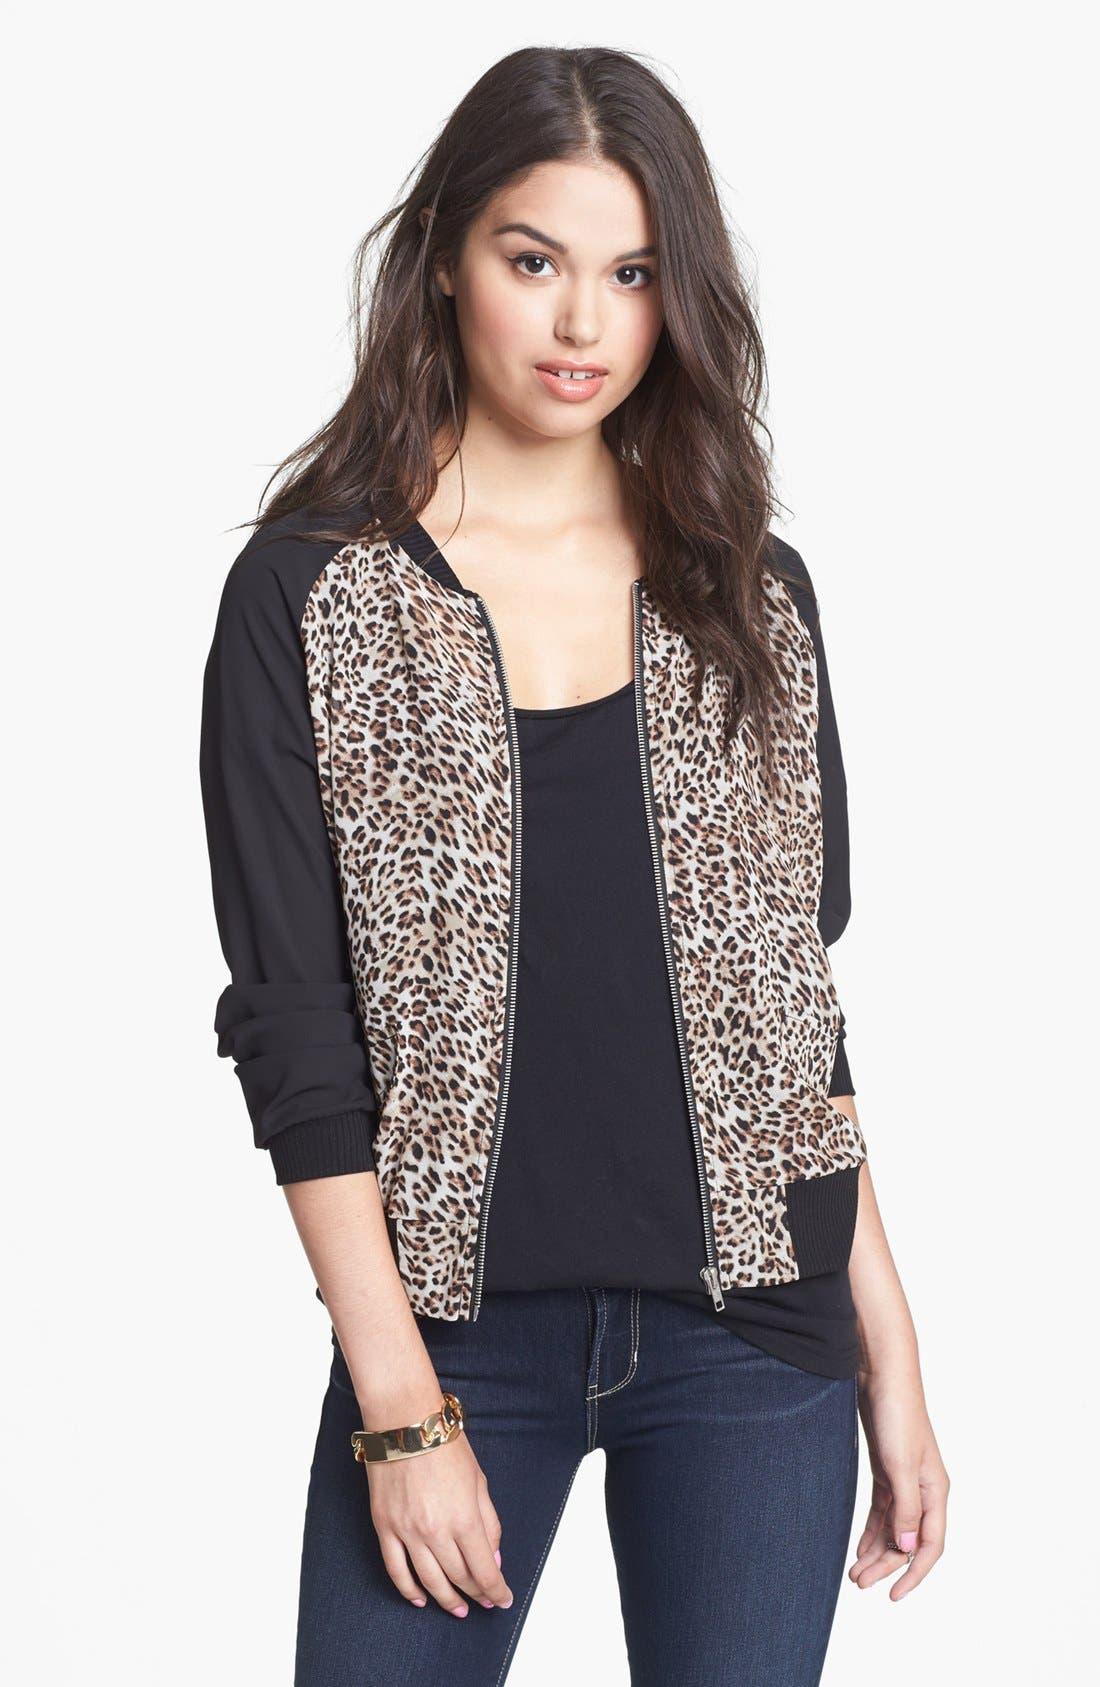 Main Image - Starling Cheetah Print Bomber Jacket (Juniors)